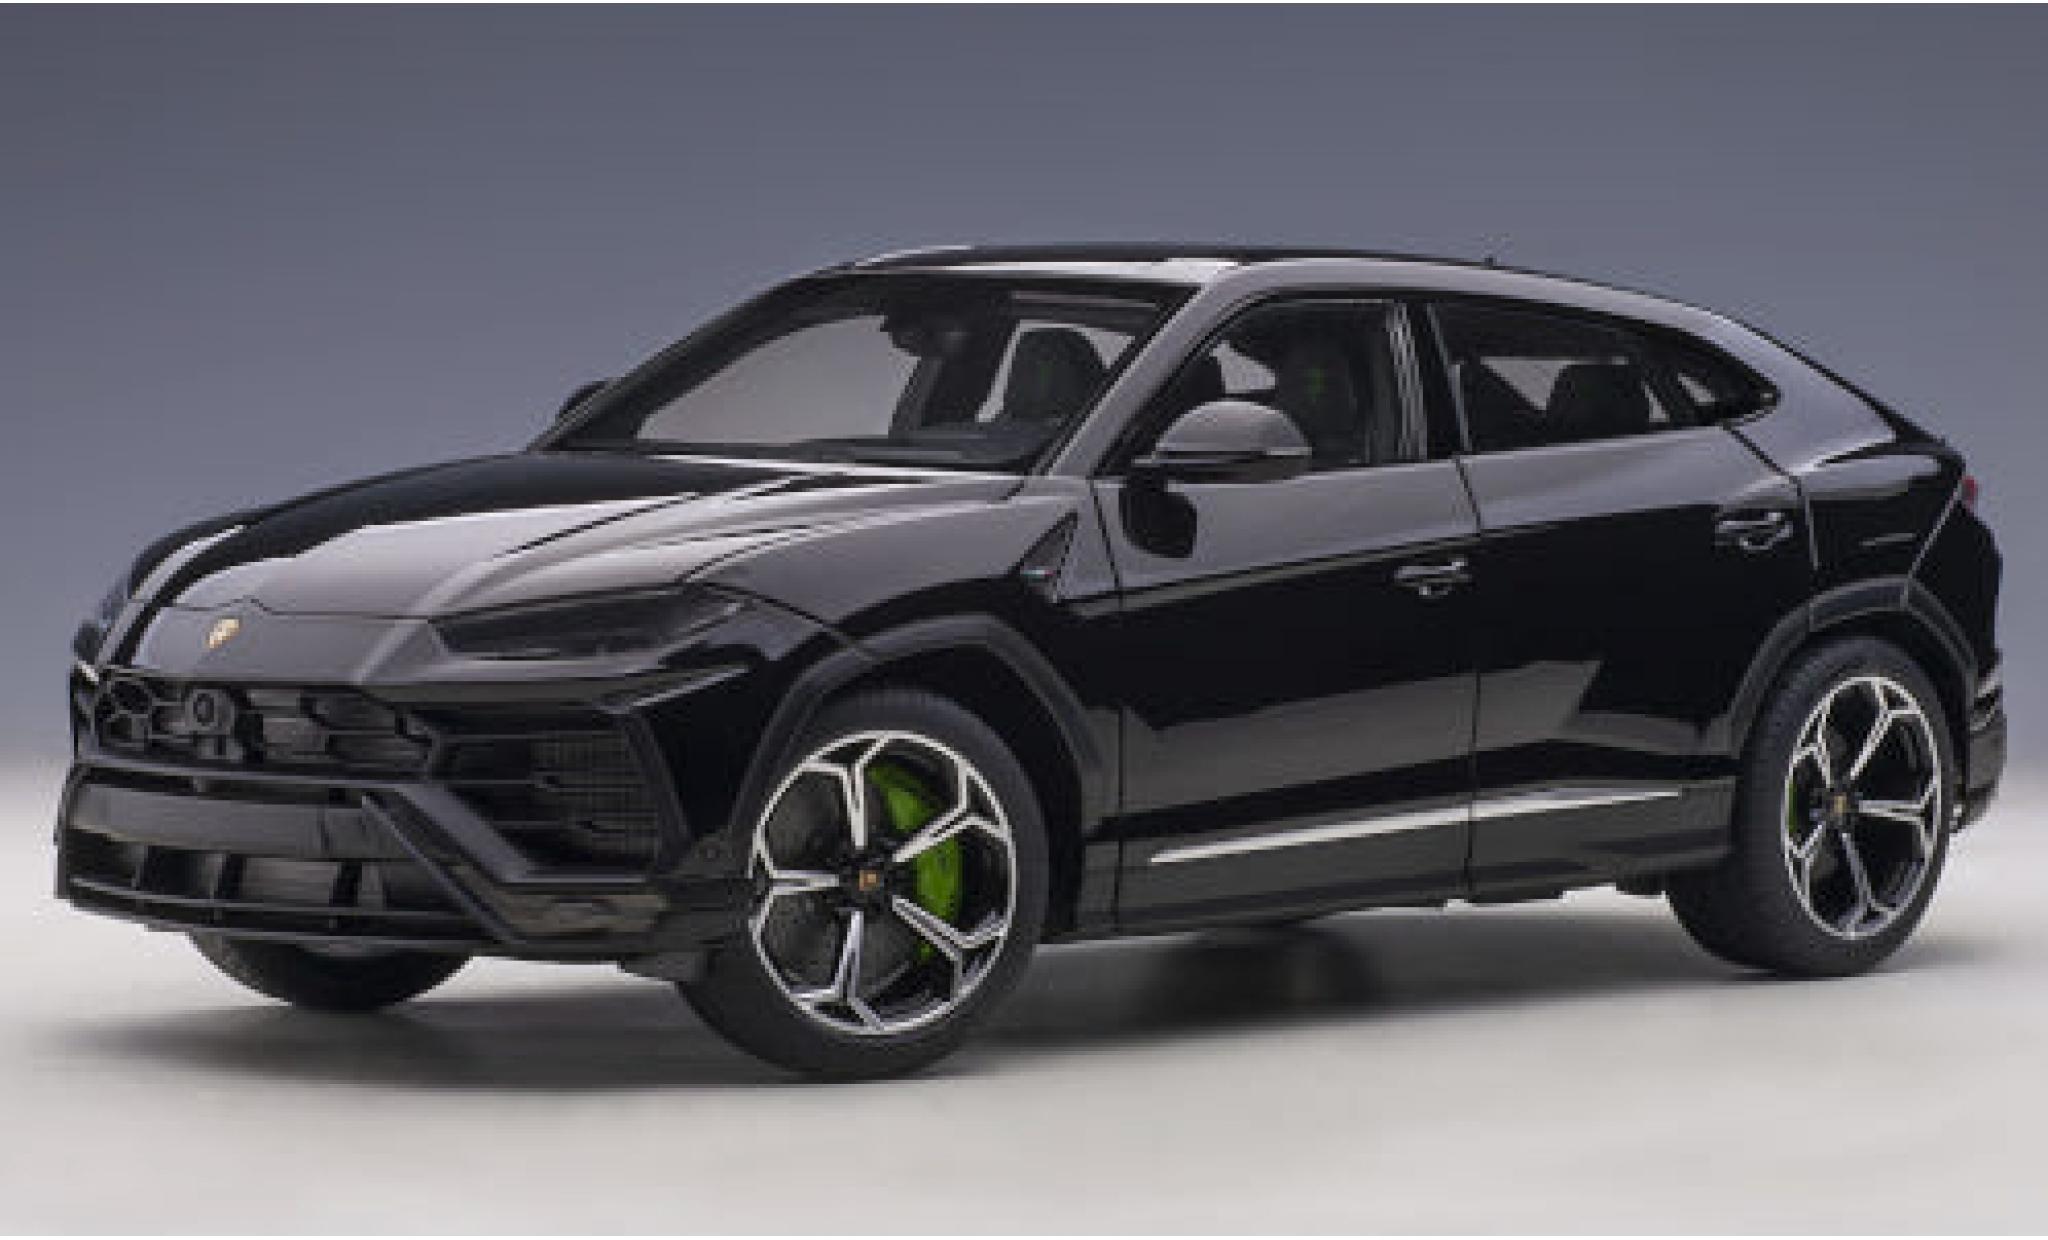 Lamborghini Urus 1/18 AUTOart black 2018